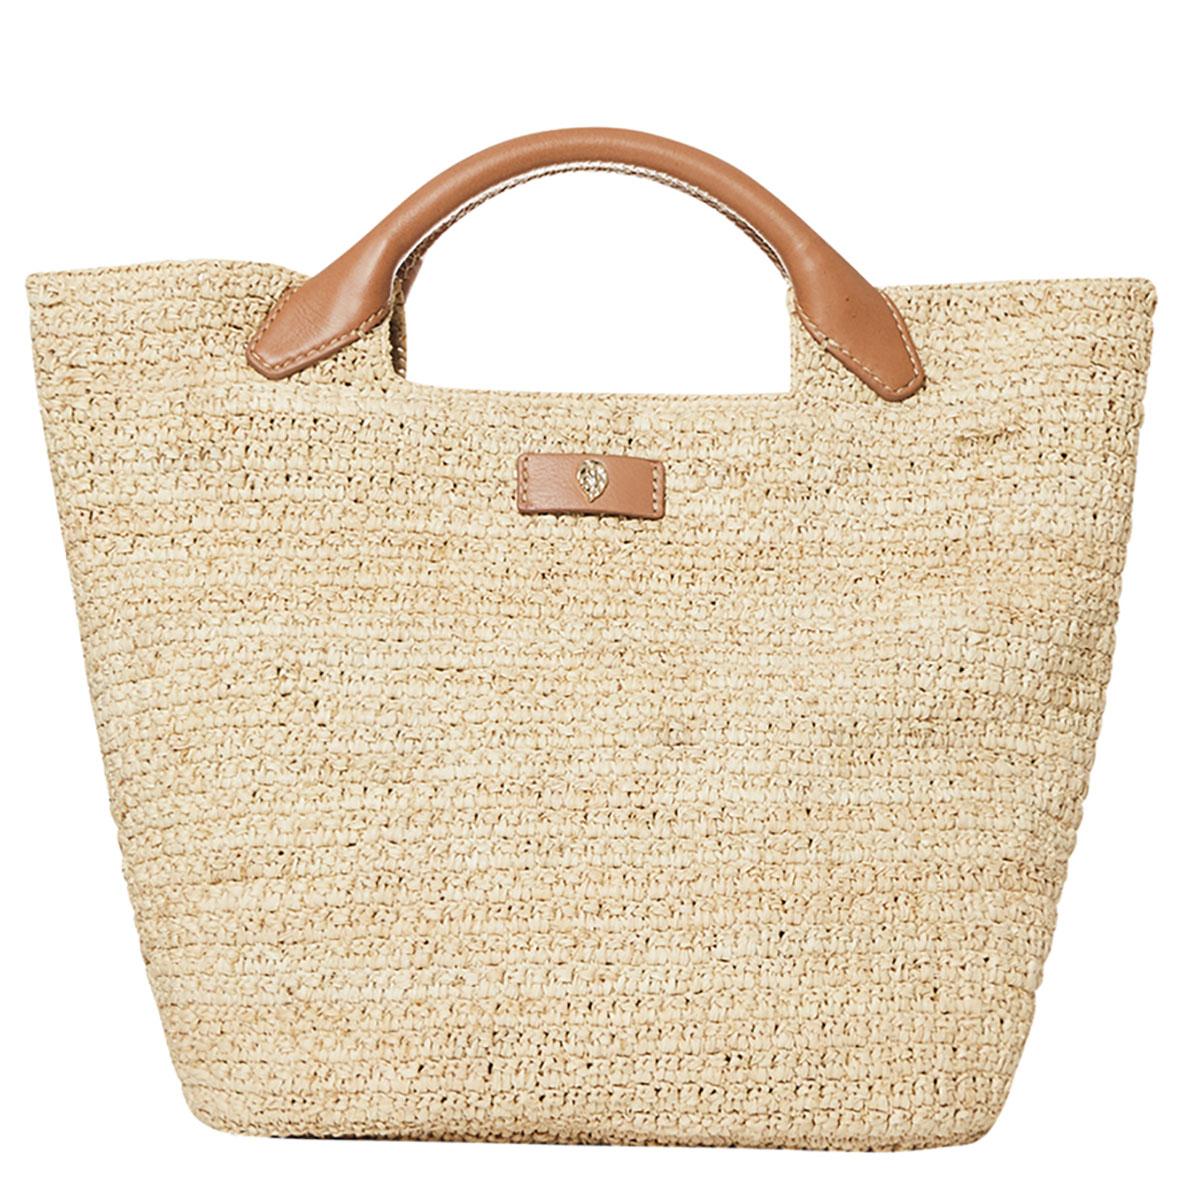 Helen Kaminski Cassia Small Basket in Natural,Tan